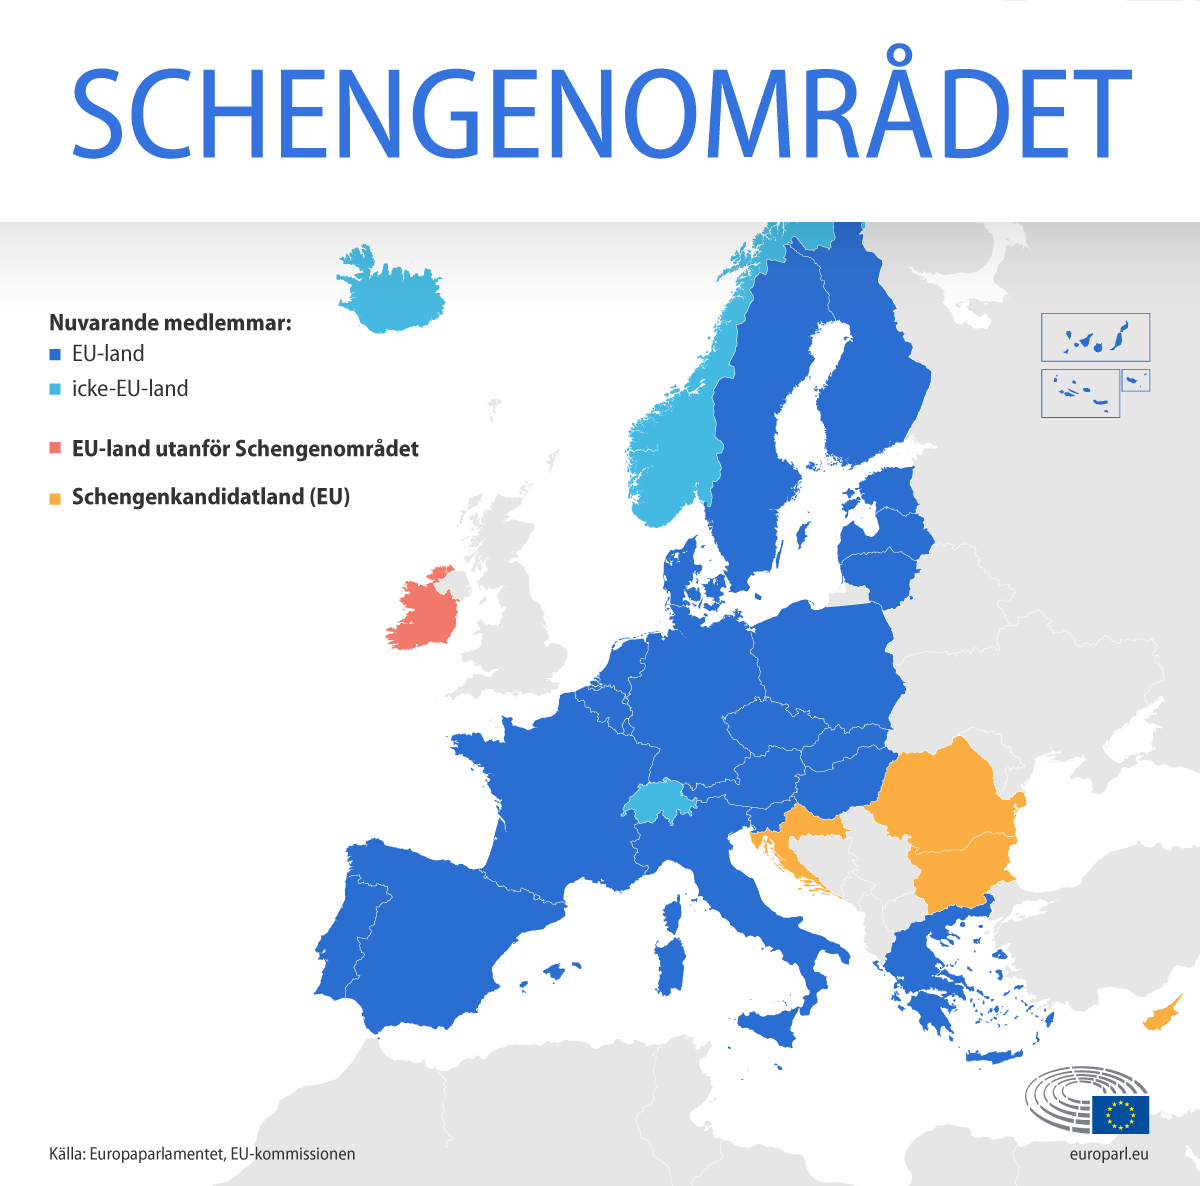 Covid 19 Oppnande Av Schengens Granser Vad Kan Eu Gora Nyheter Europaparlamentet